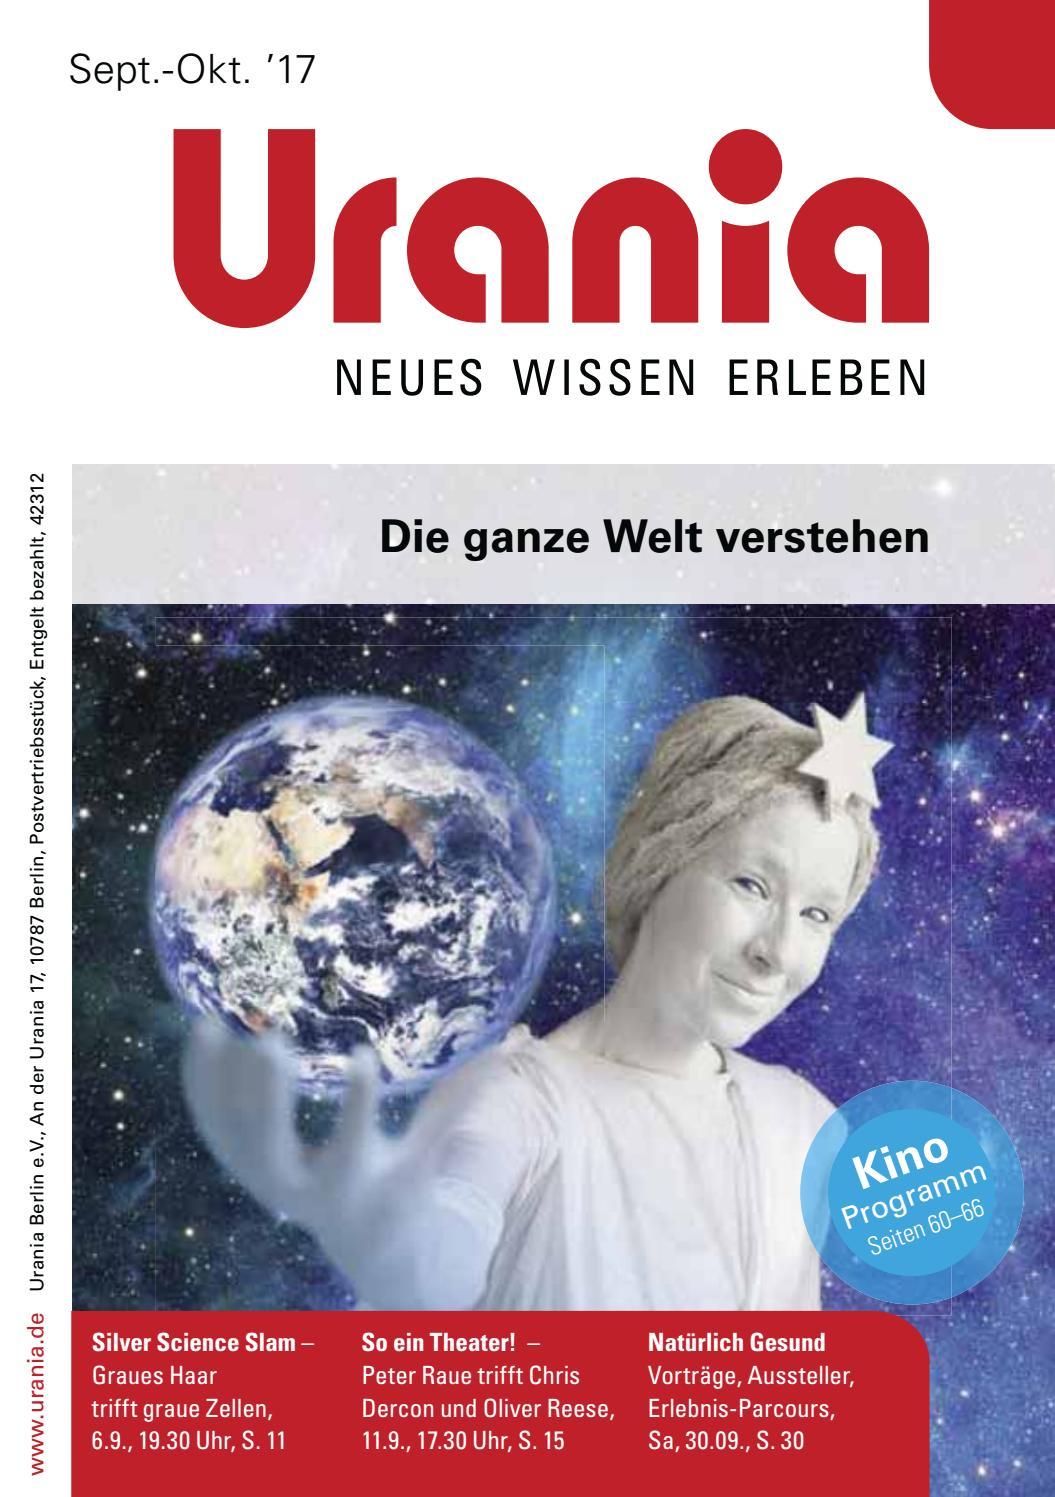 Urania Programmheft Sep Okt 2017 By Urania Berlin Issuu